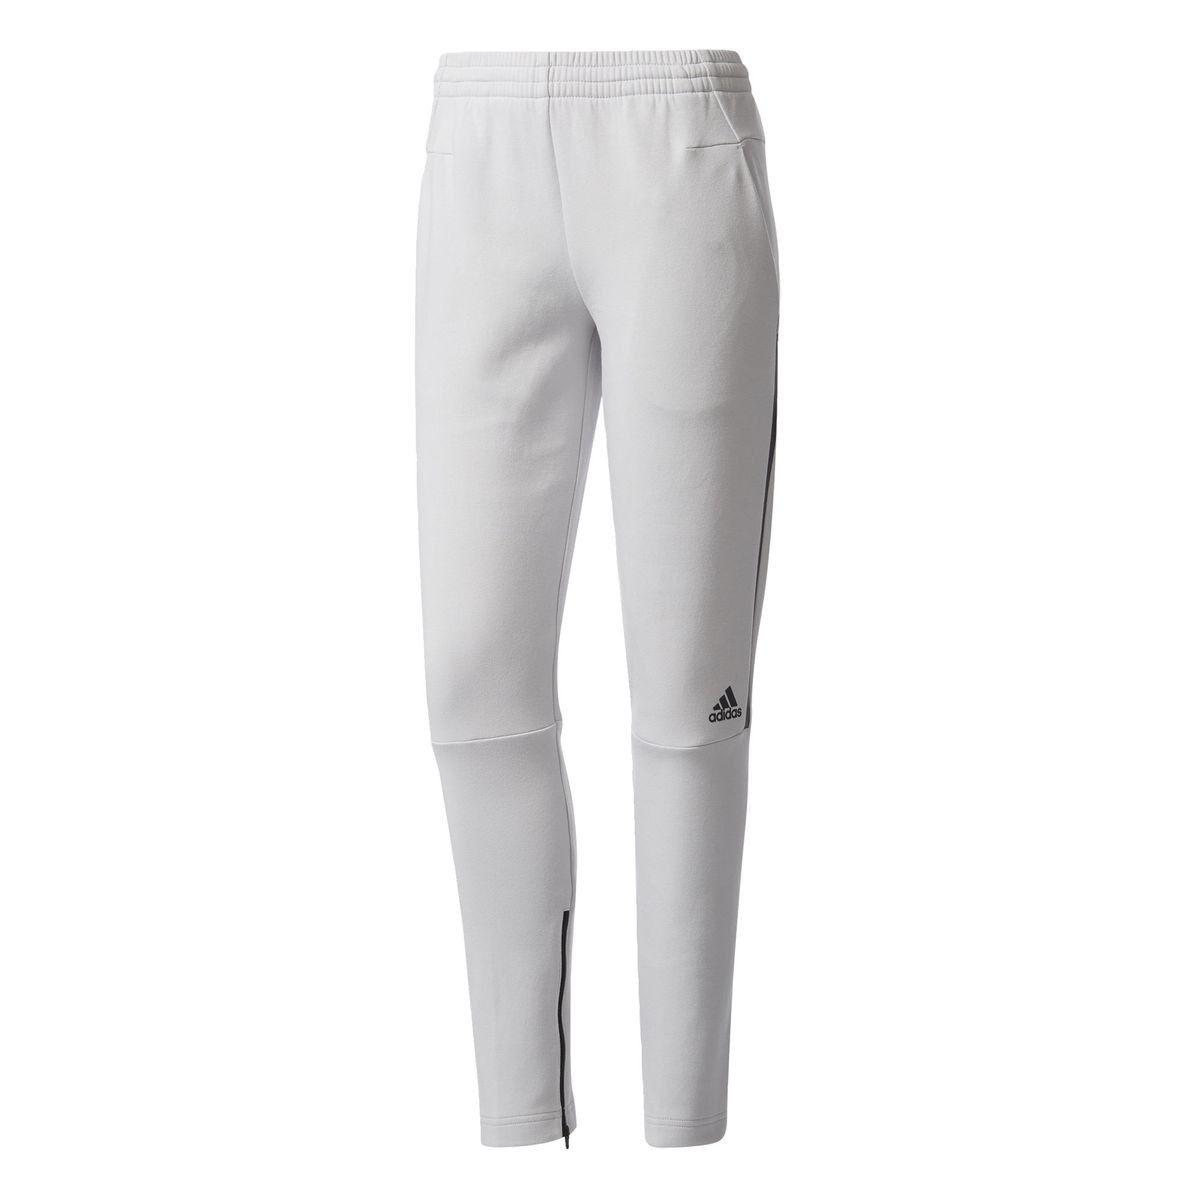 pantalon garcon 10 ans adidas